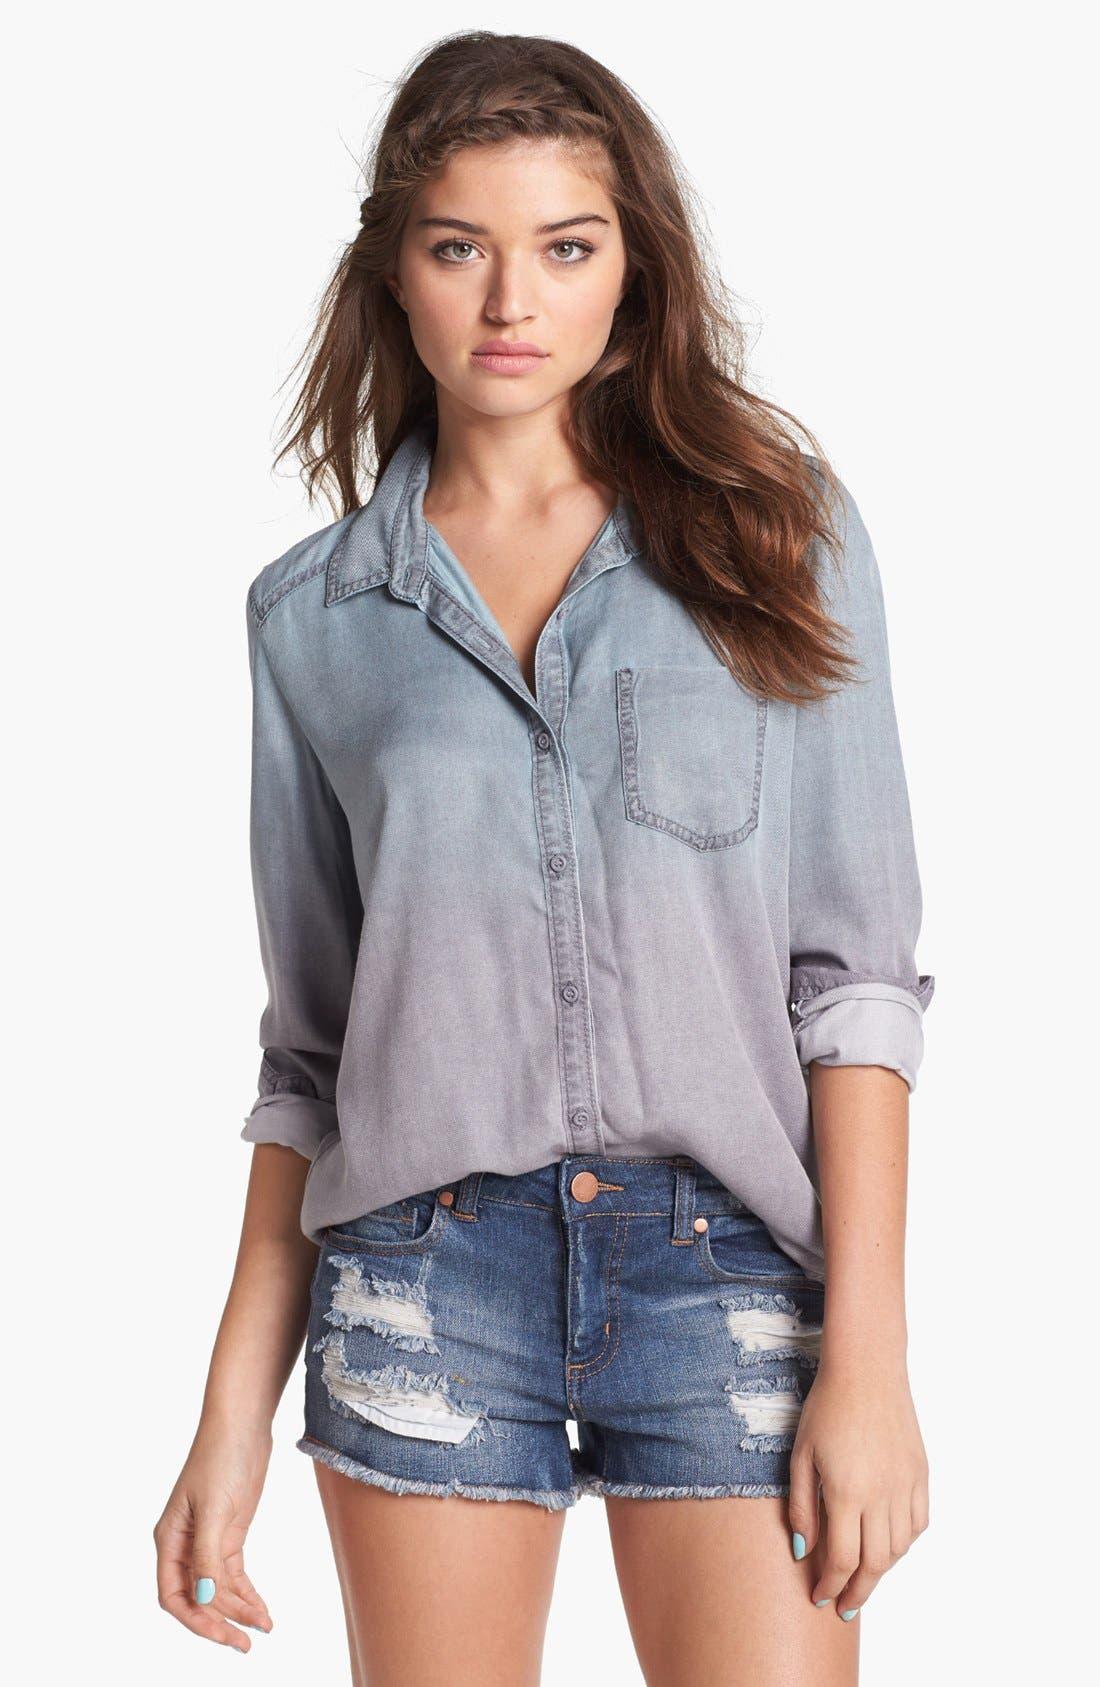 Alternate Image 1 Selected - Rubbish® Ombré Shirt (Juniors)